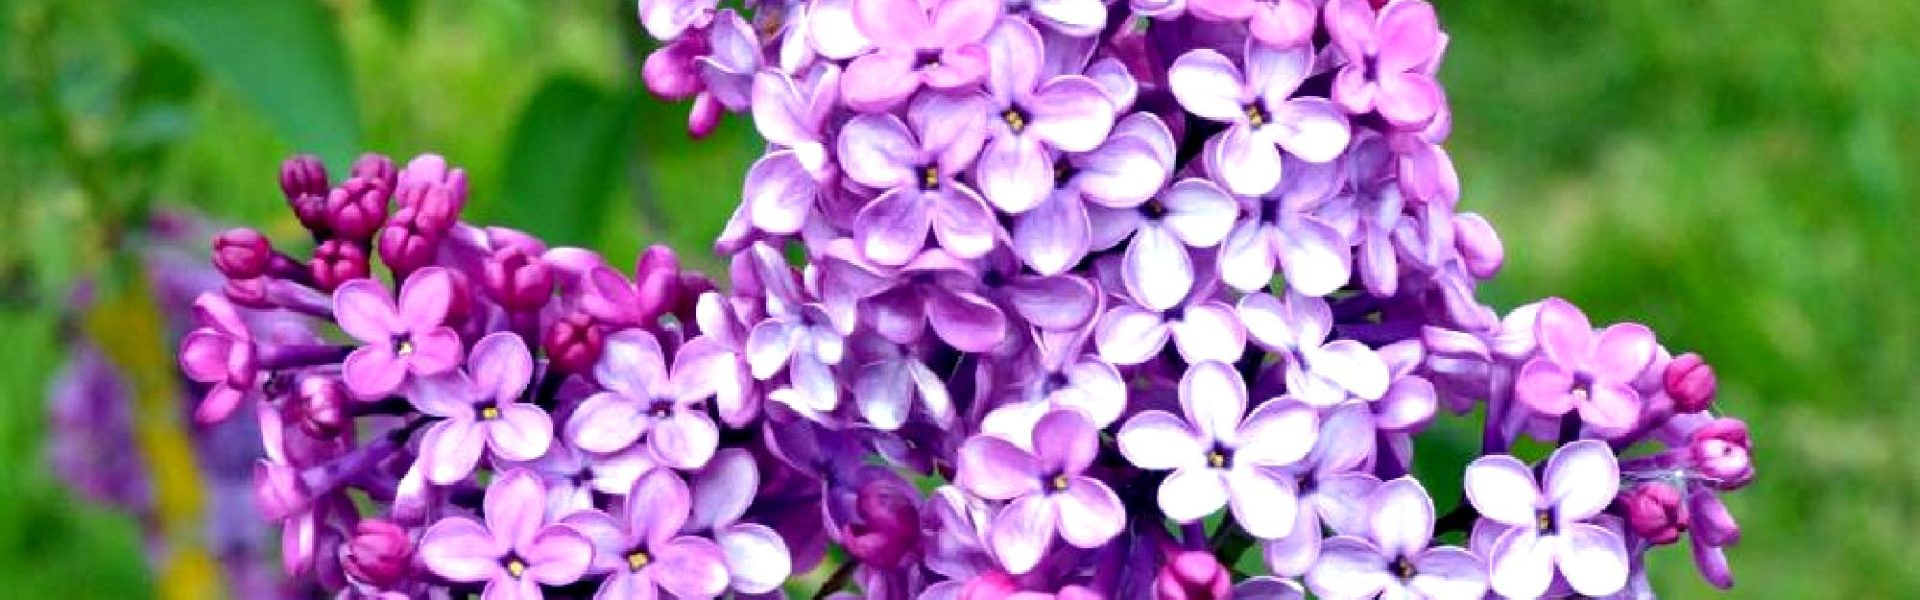 Lilas mauve Jardins de Broéliande. Photo Thomas Crabot